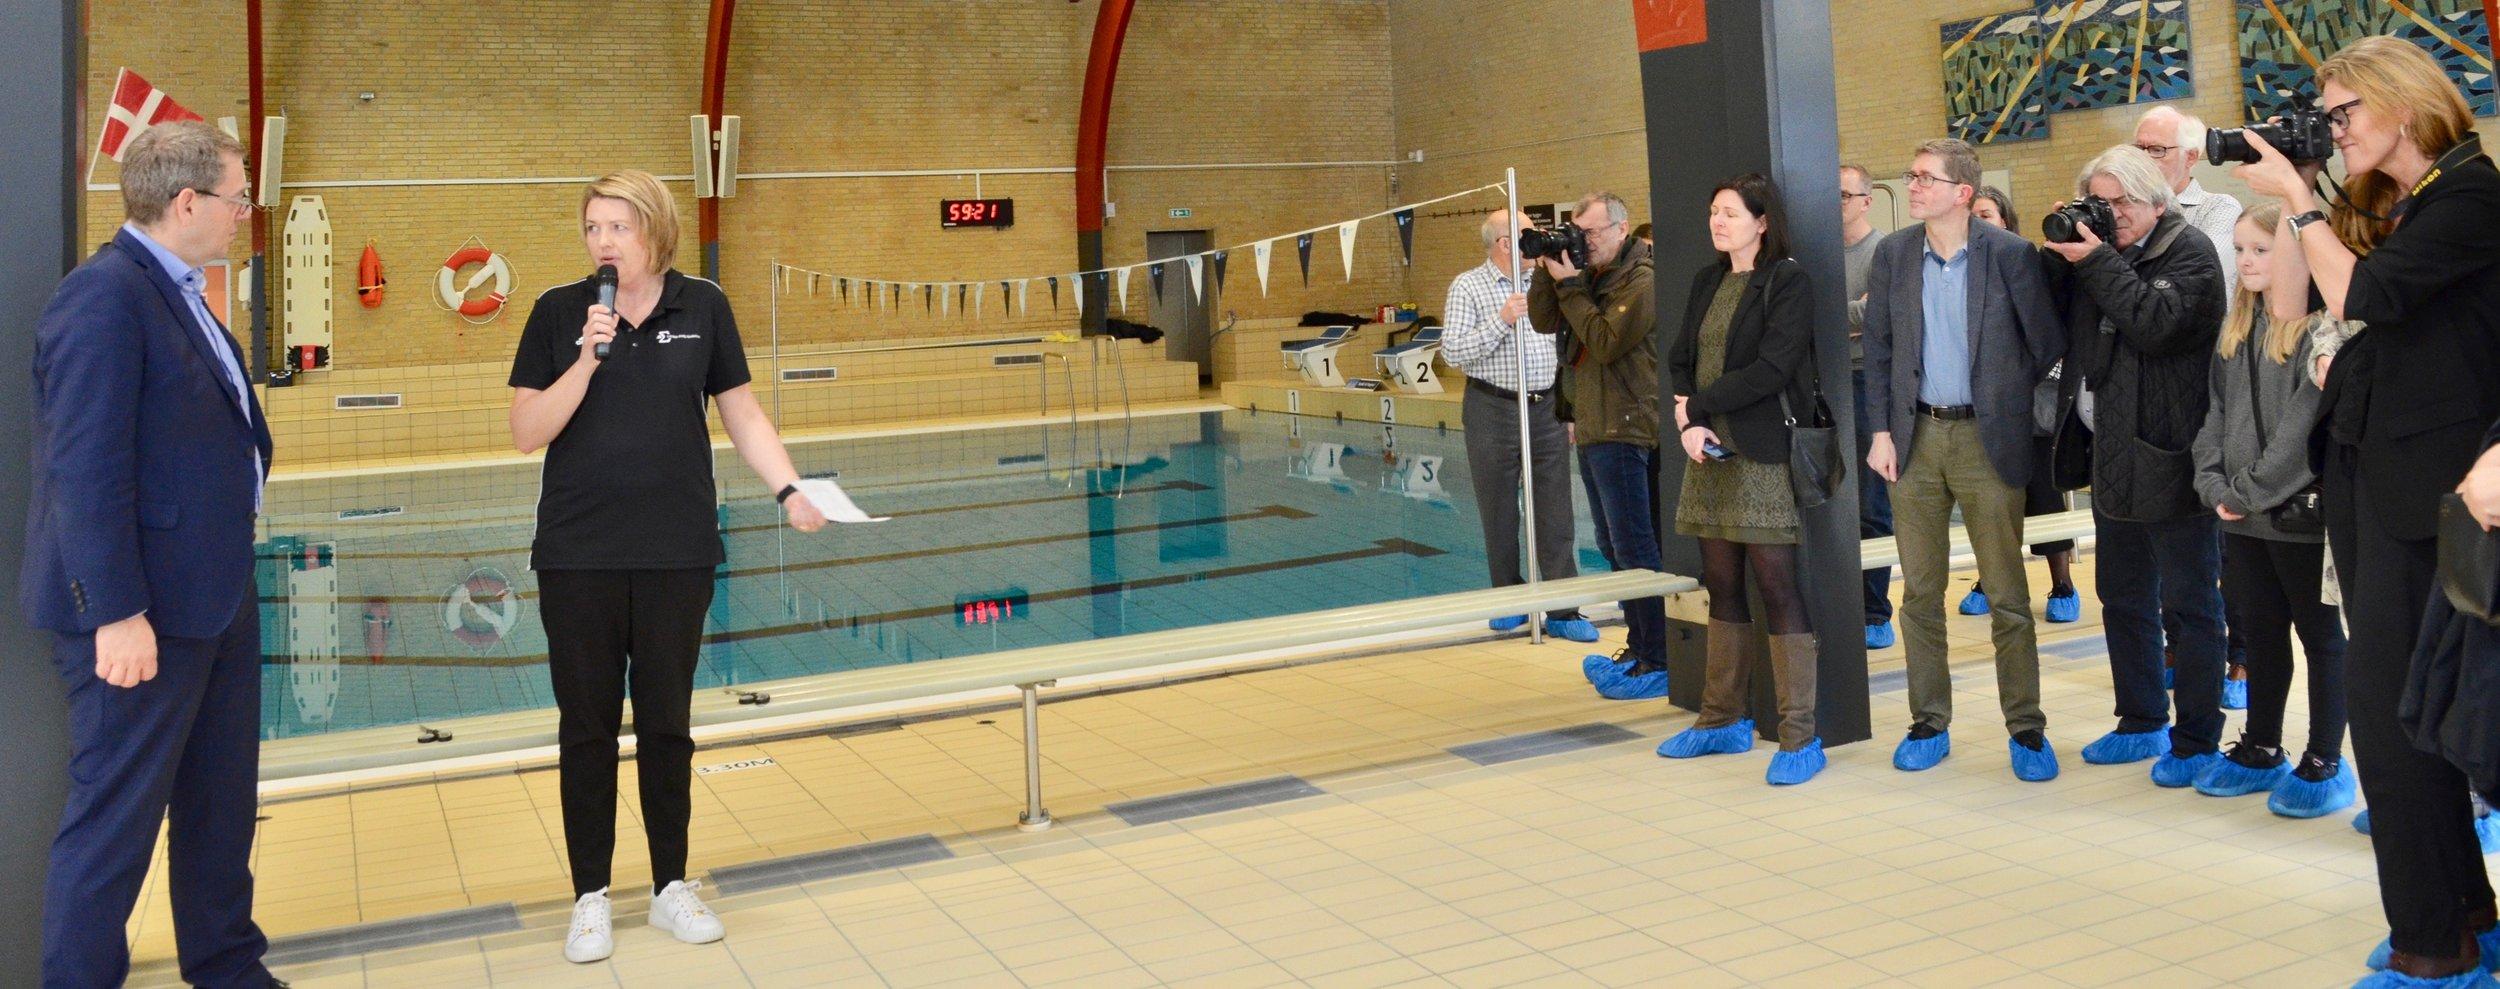 "Louise Krag Andersen: ""Vi føler næsten, at vi har fået en ny svømmehal."" Foto: AOB"